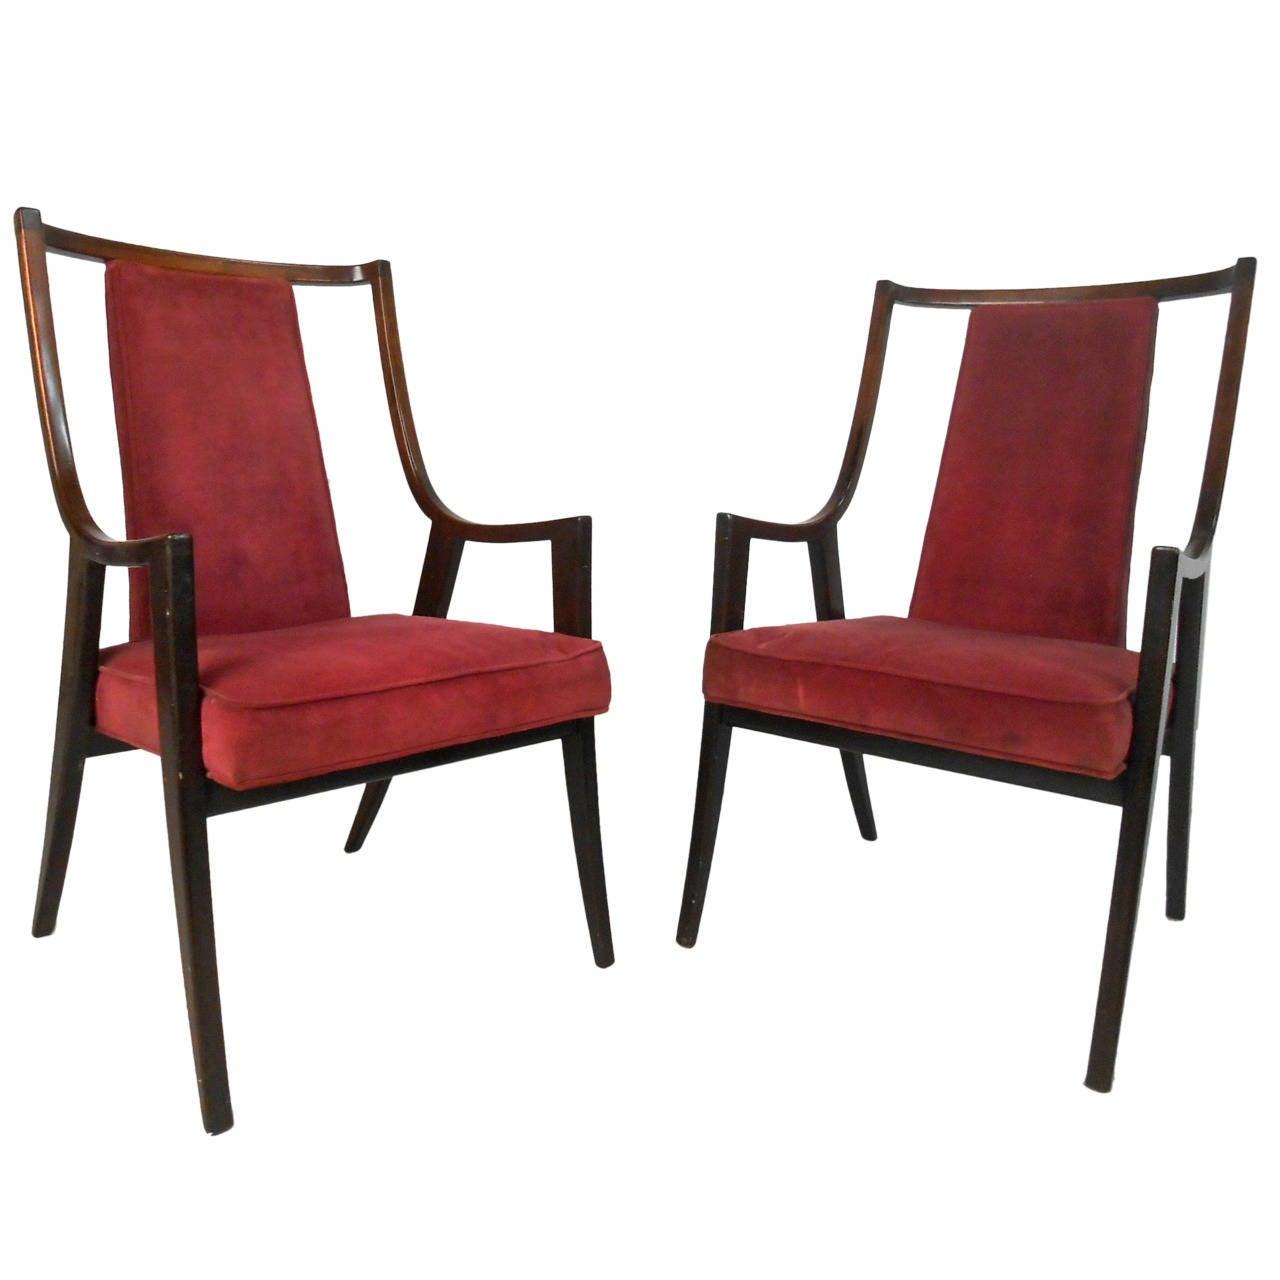 Pair mid century modern t h robsjohn gibbings style for Mid century modern armchairs